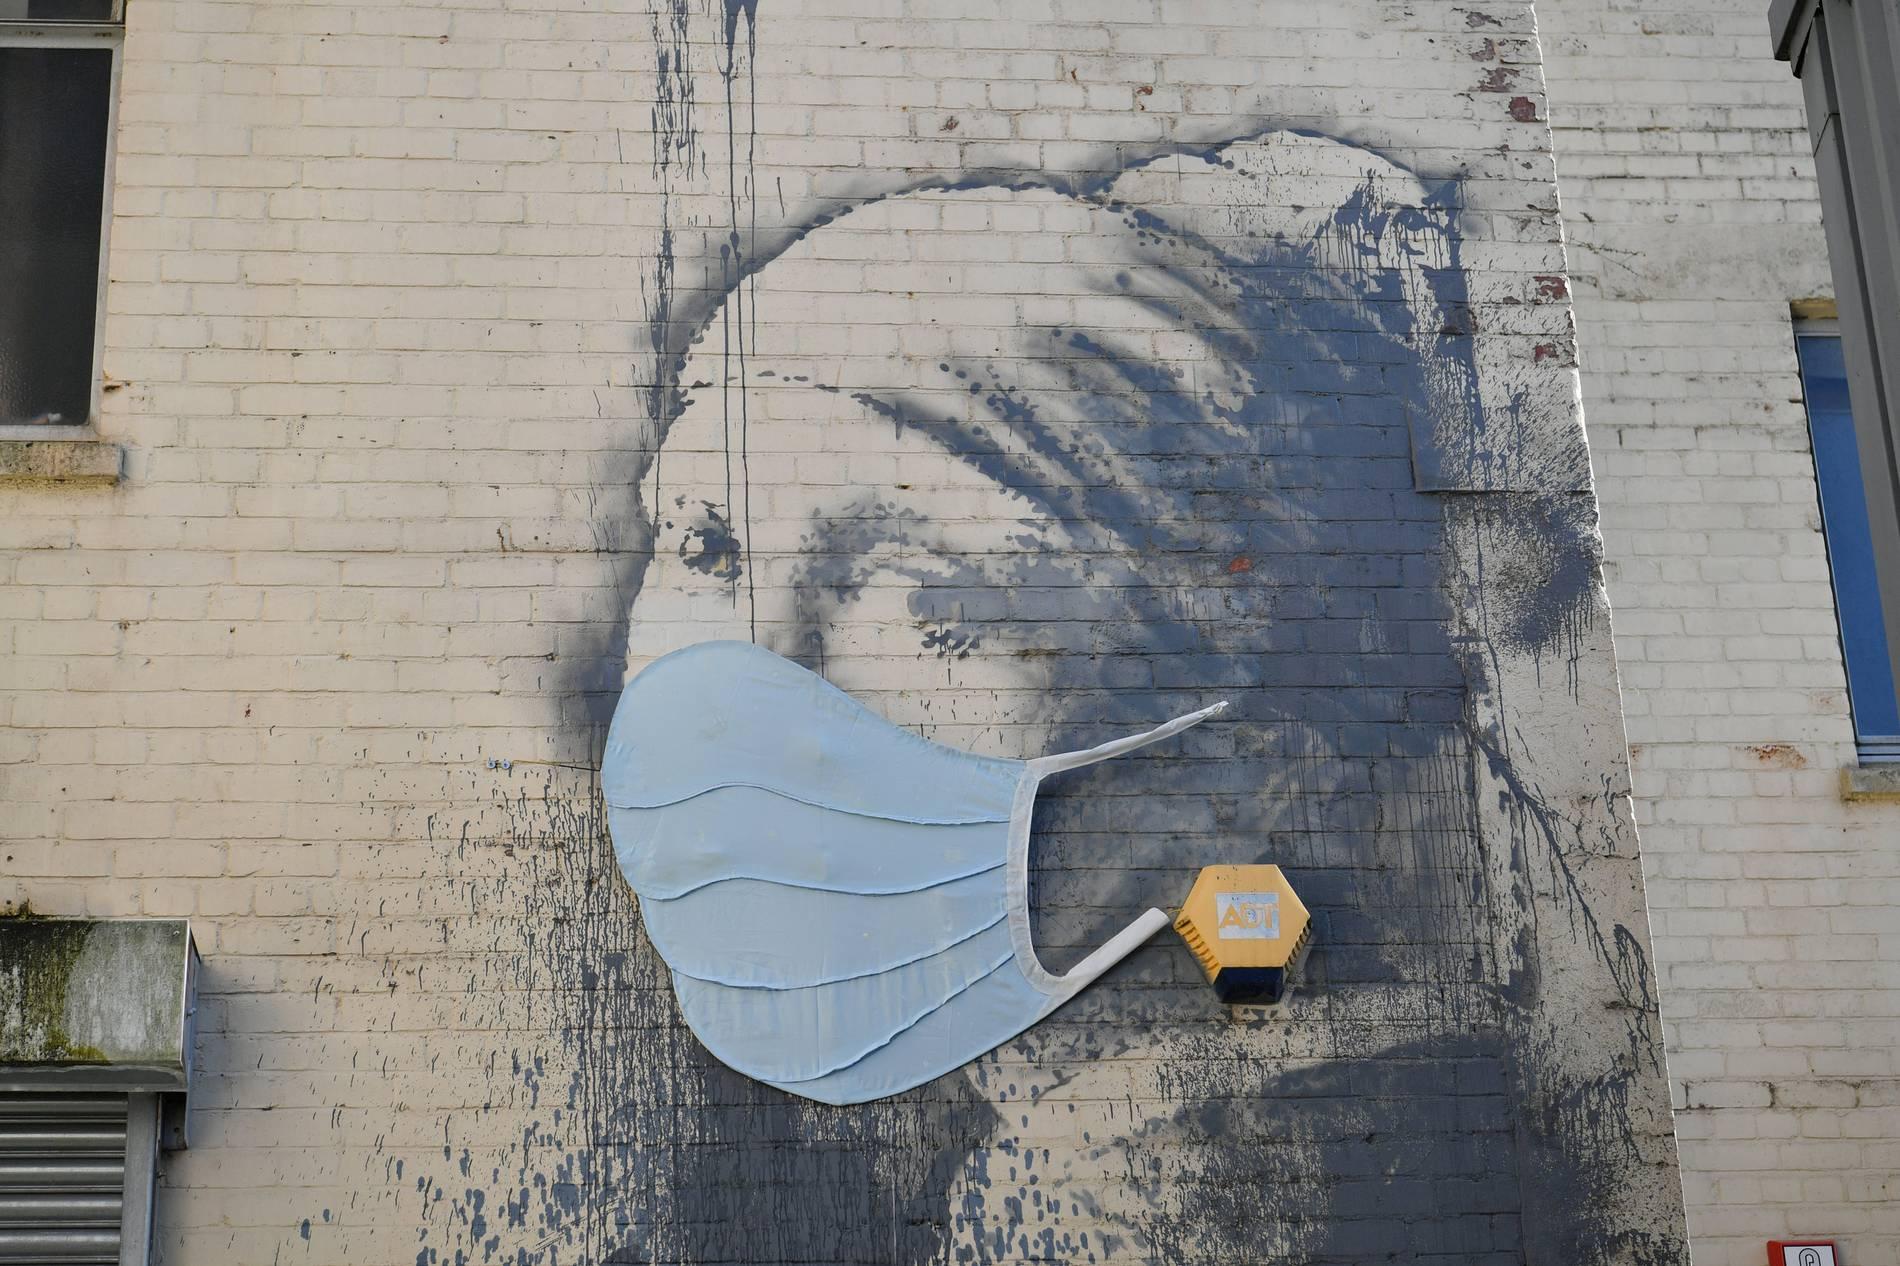 Banksys Corona-Appell in Londoner U-Bahn von Behörden entfernt